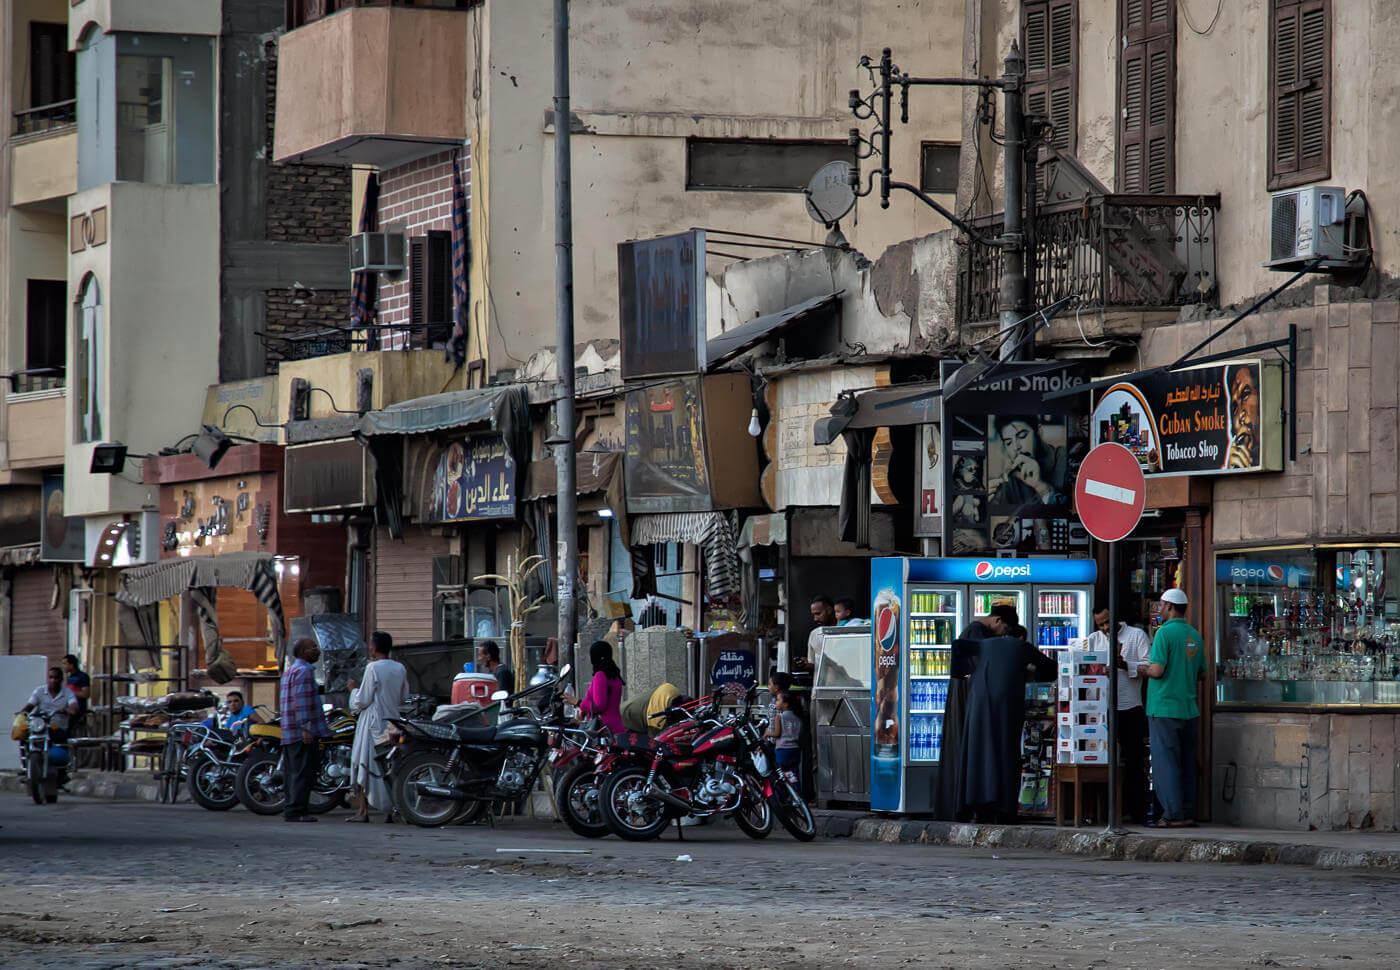 Street in Luxor, Egypt - Photo by Zdenek Sindelar of CuriousZed Photography